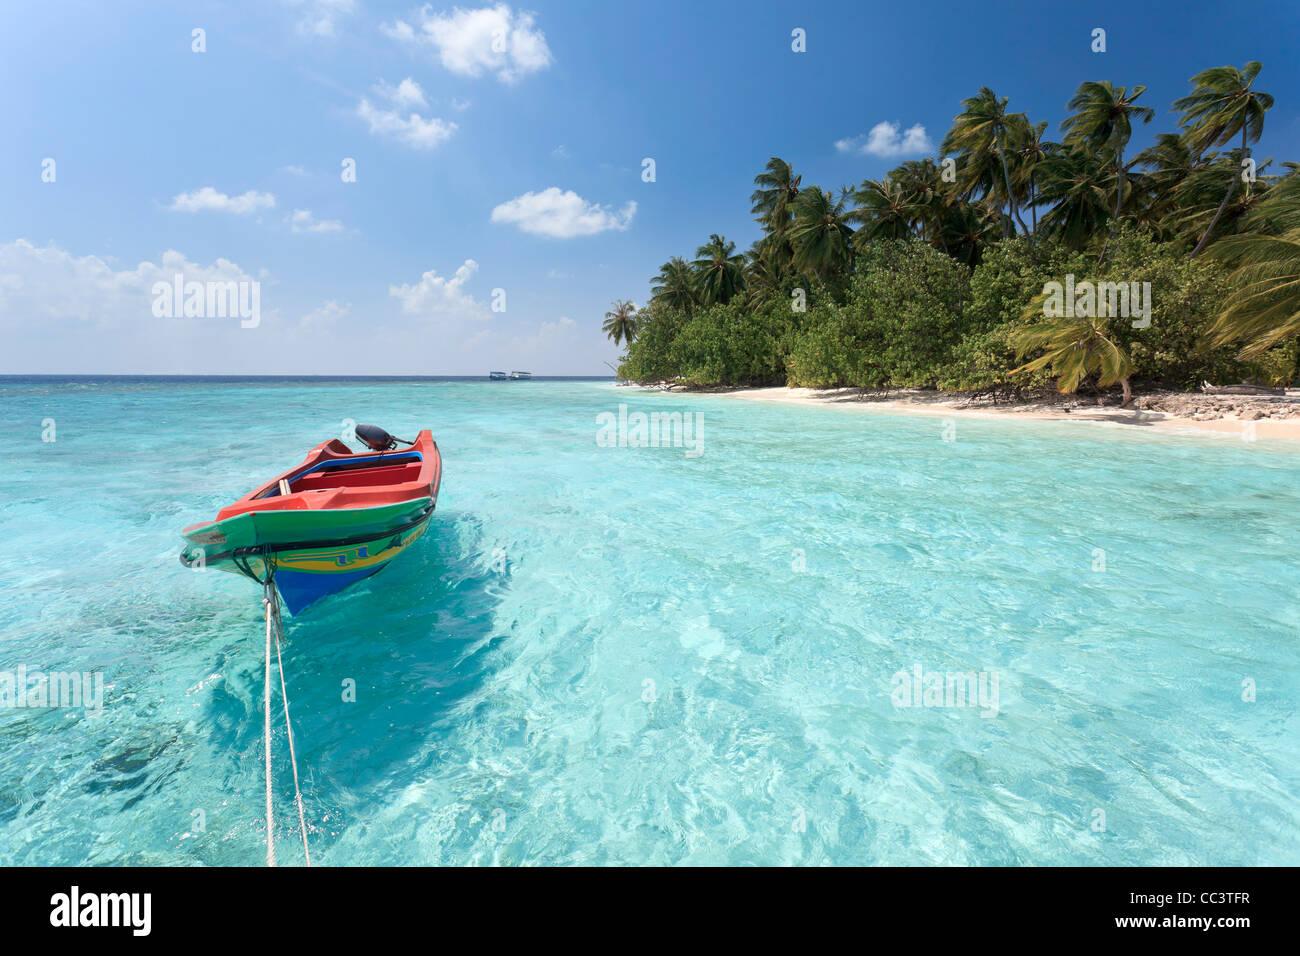 Maldives, Male Atoll, Kuda Bandos Island - Stock Image